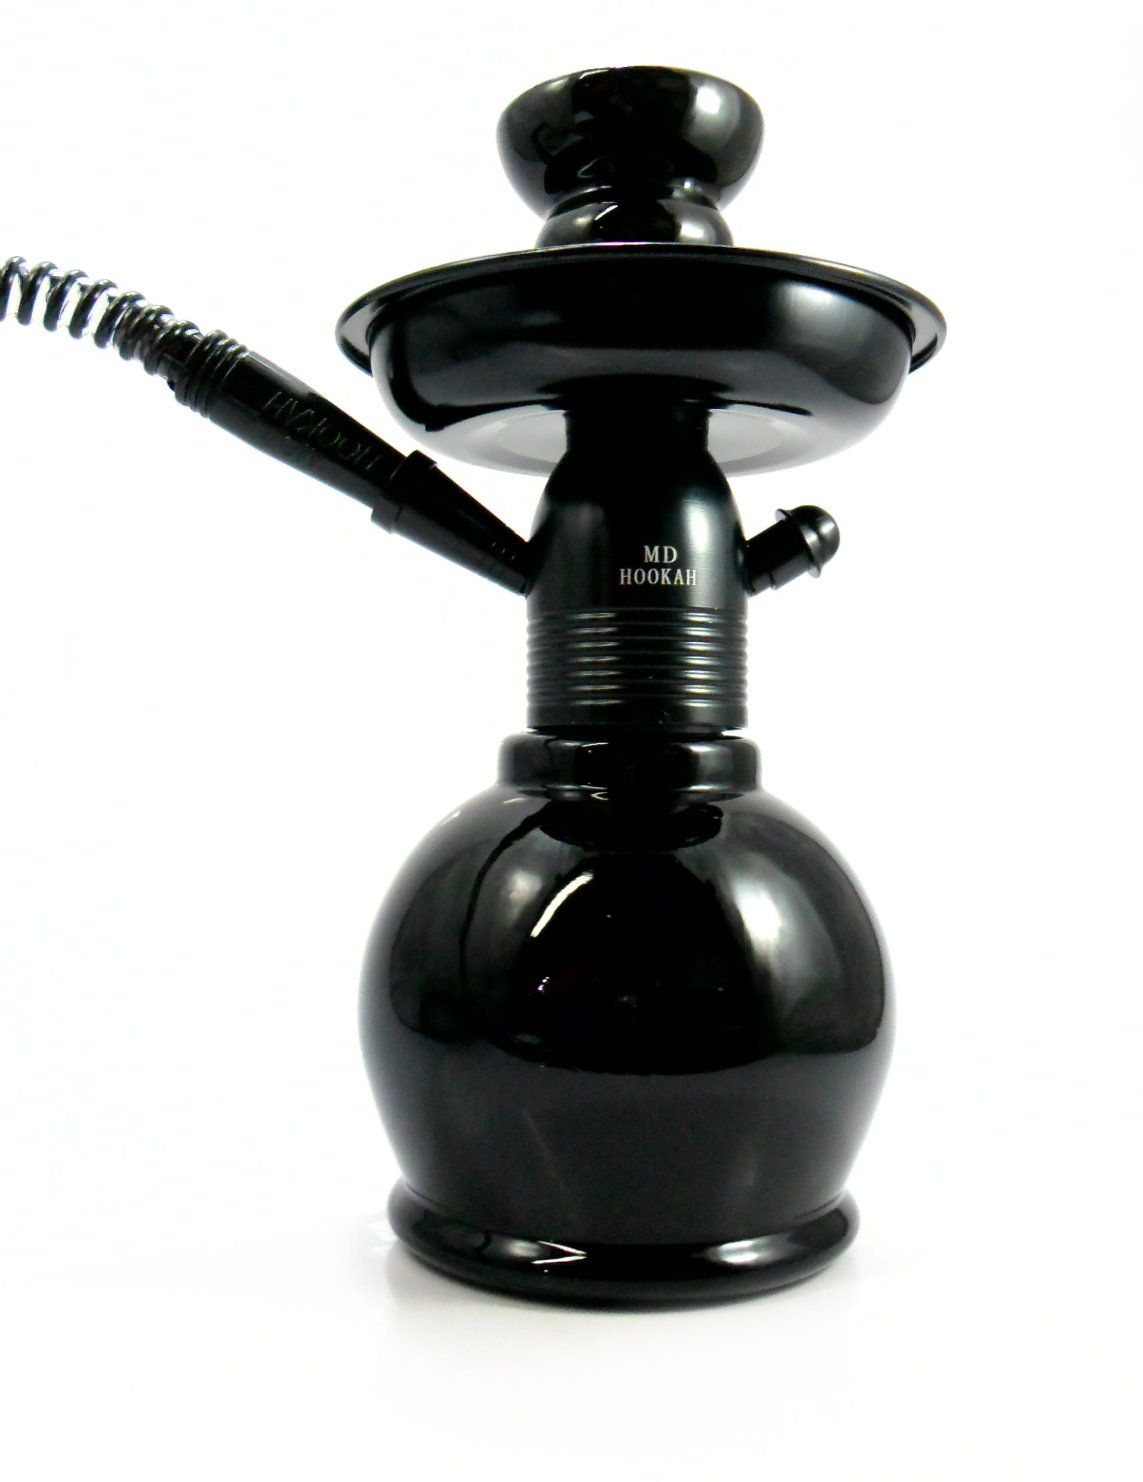 Narguile MD Hookah NEW 26cm PRETO. Vaso Ball PRETO, stem usinado em alumínio, pintura anodizada.